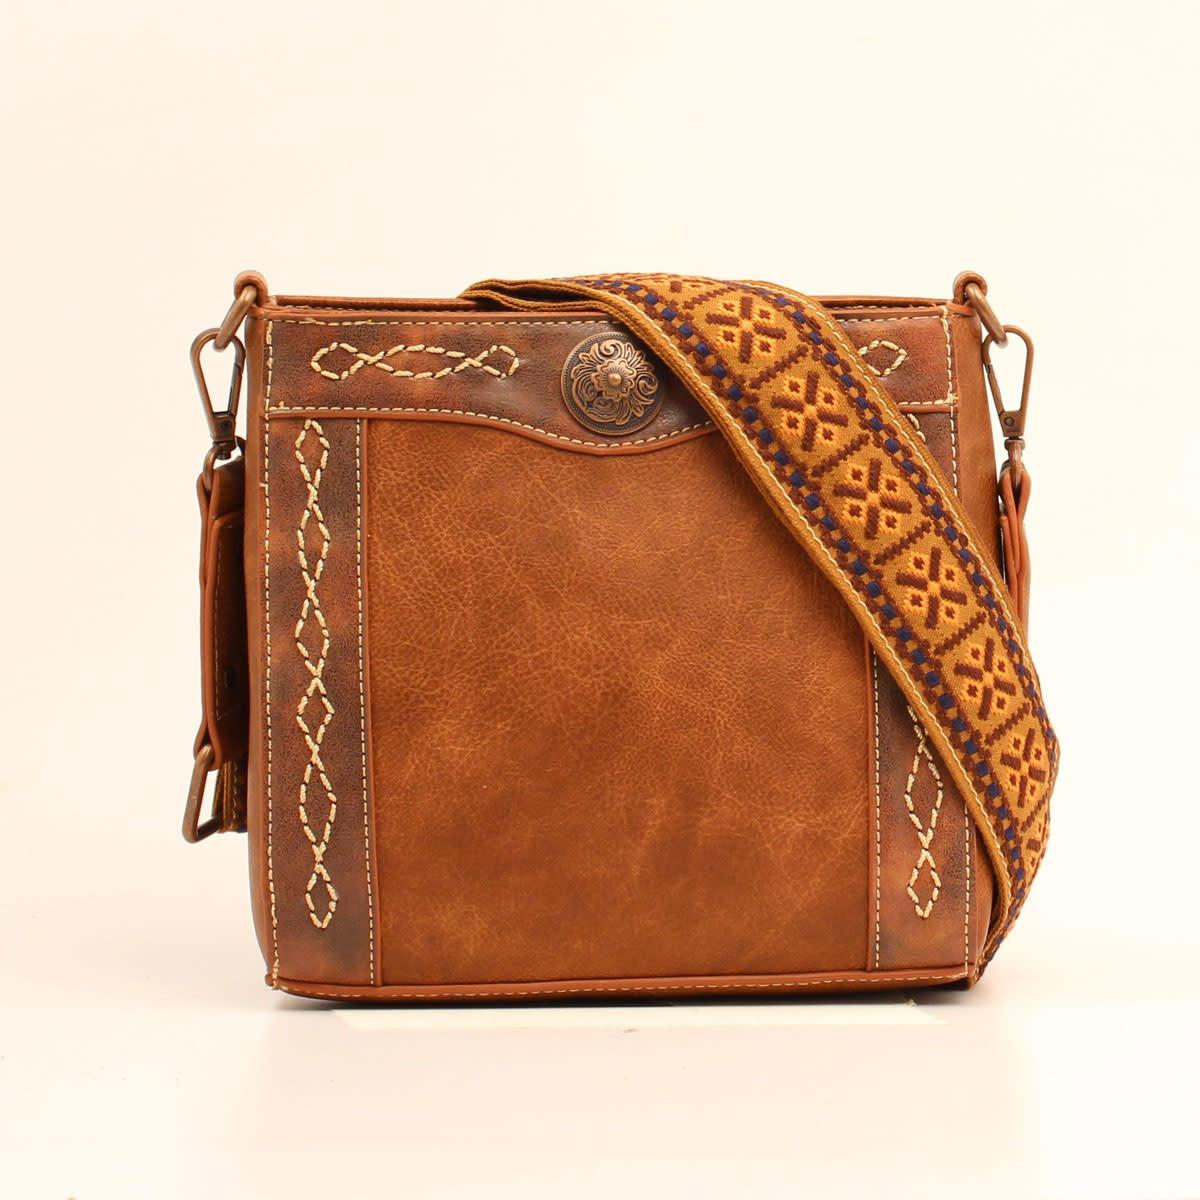 Handbag - Conceal Carry Ivy Crossbody Bag